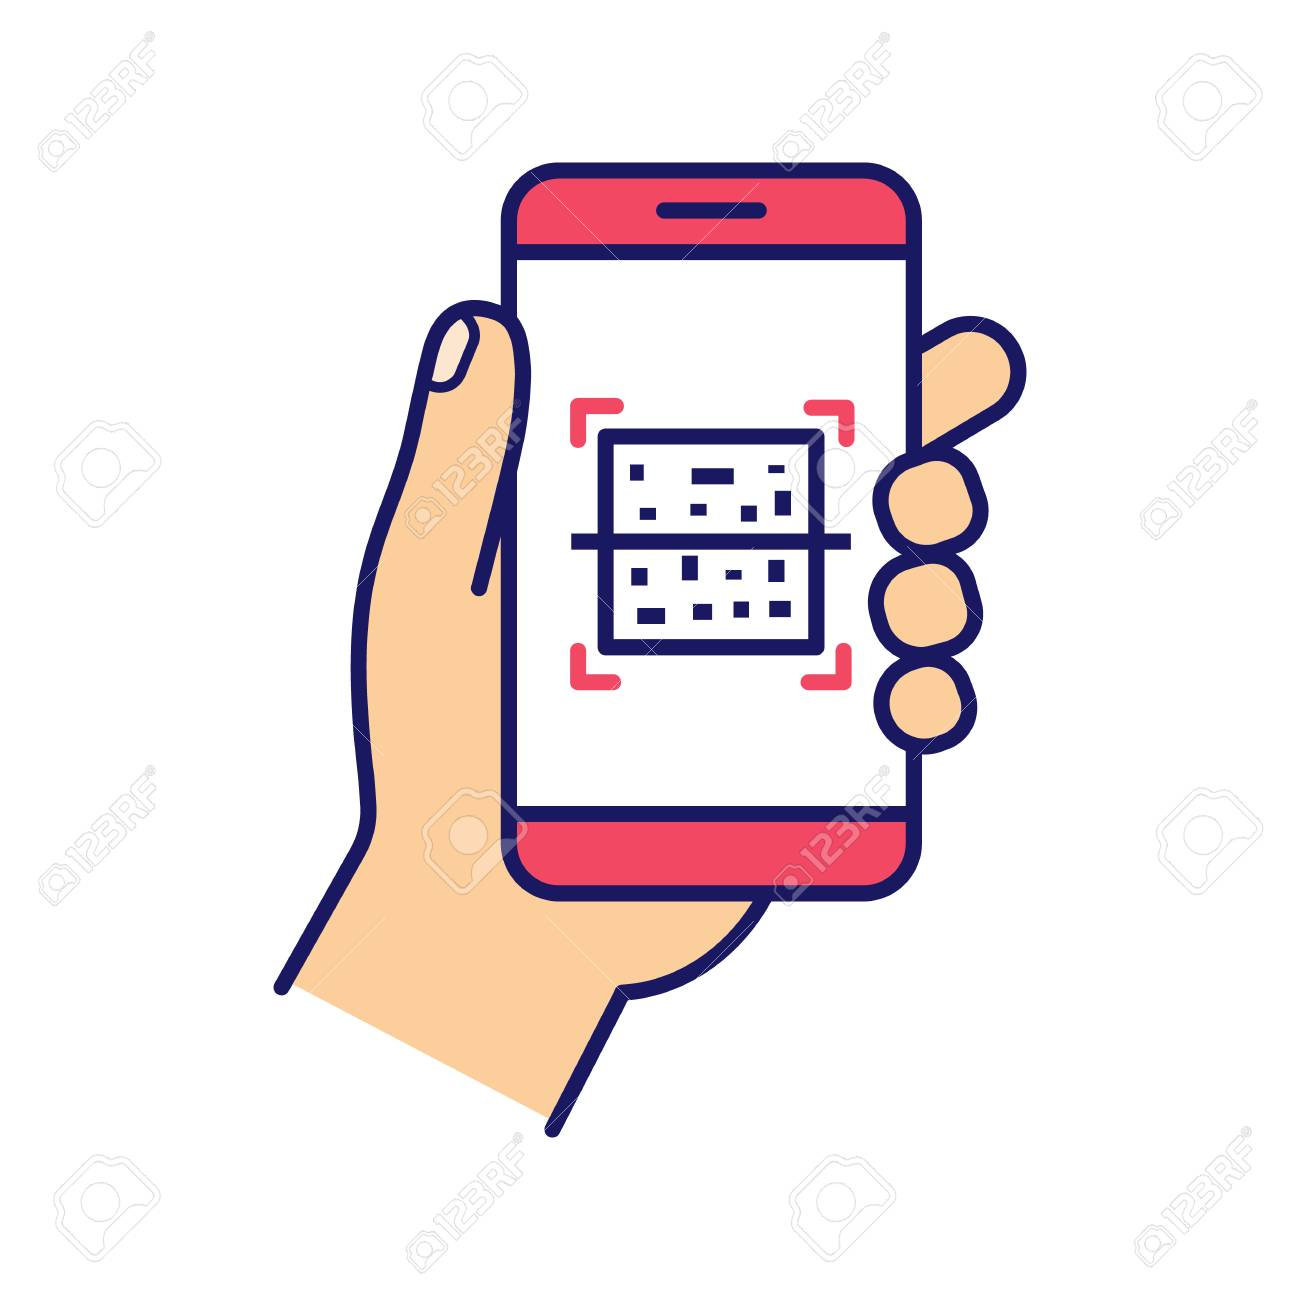 QR code smartphone scanner color icon  Quick response code  Matrix